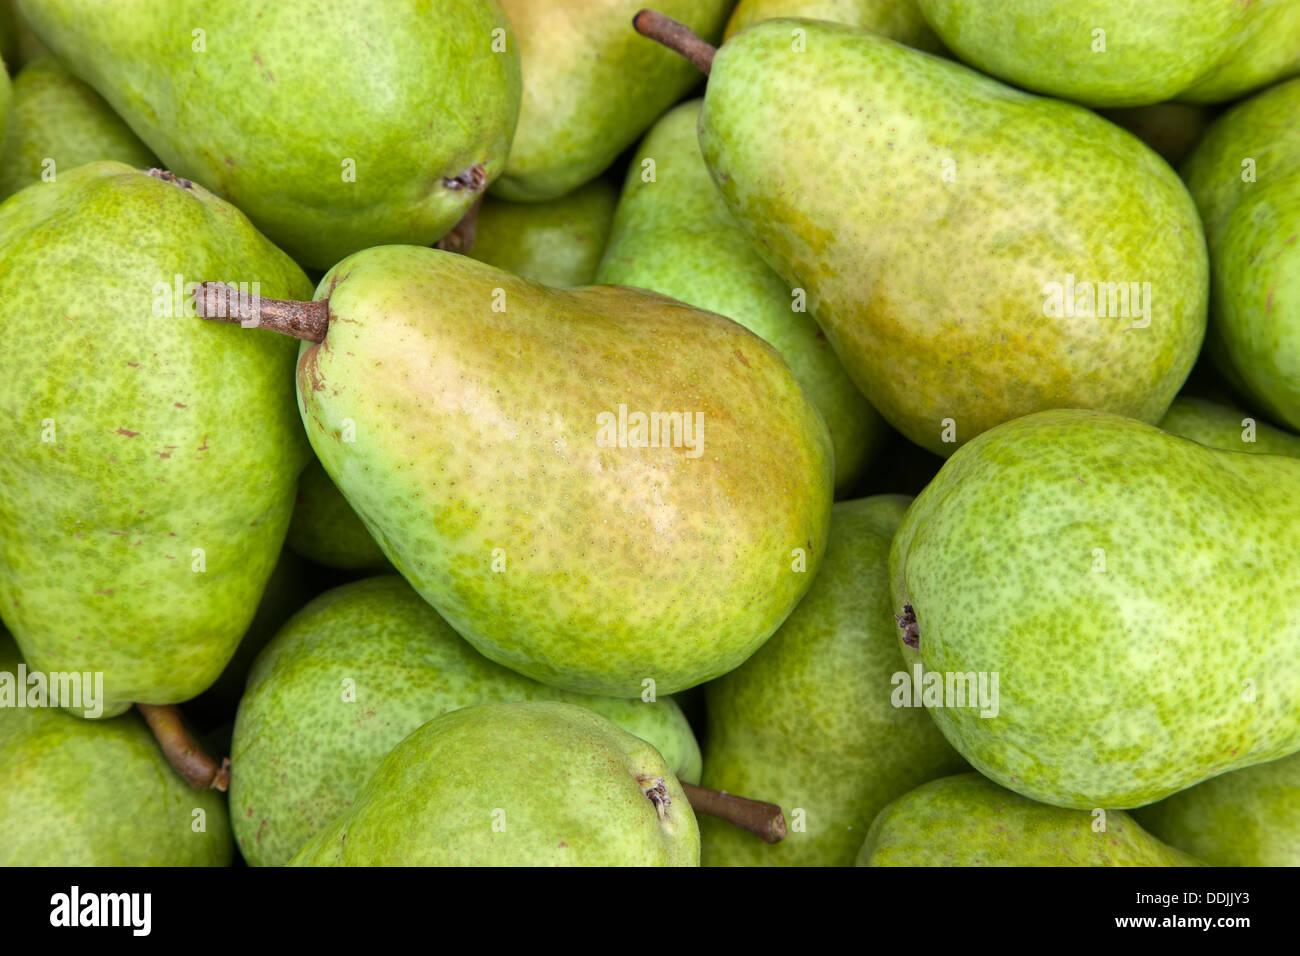 Harvested bartlett pears 'Pyrus communis'. - Stock Image